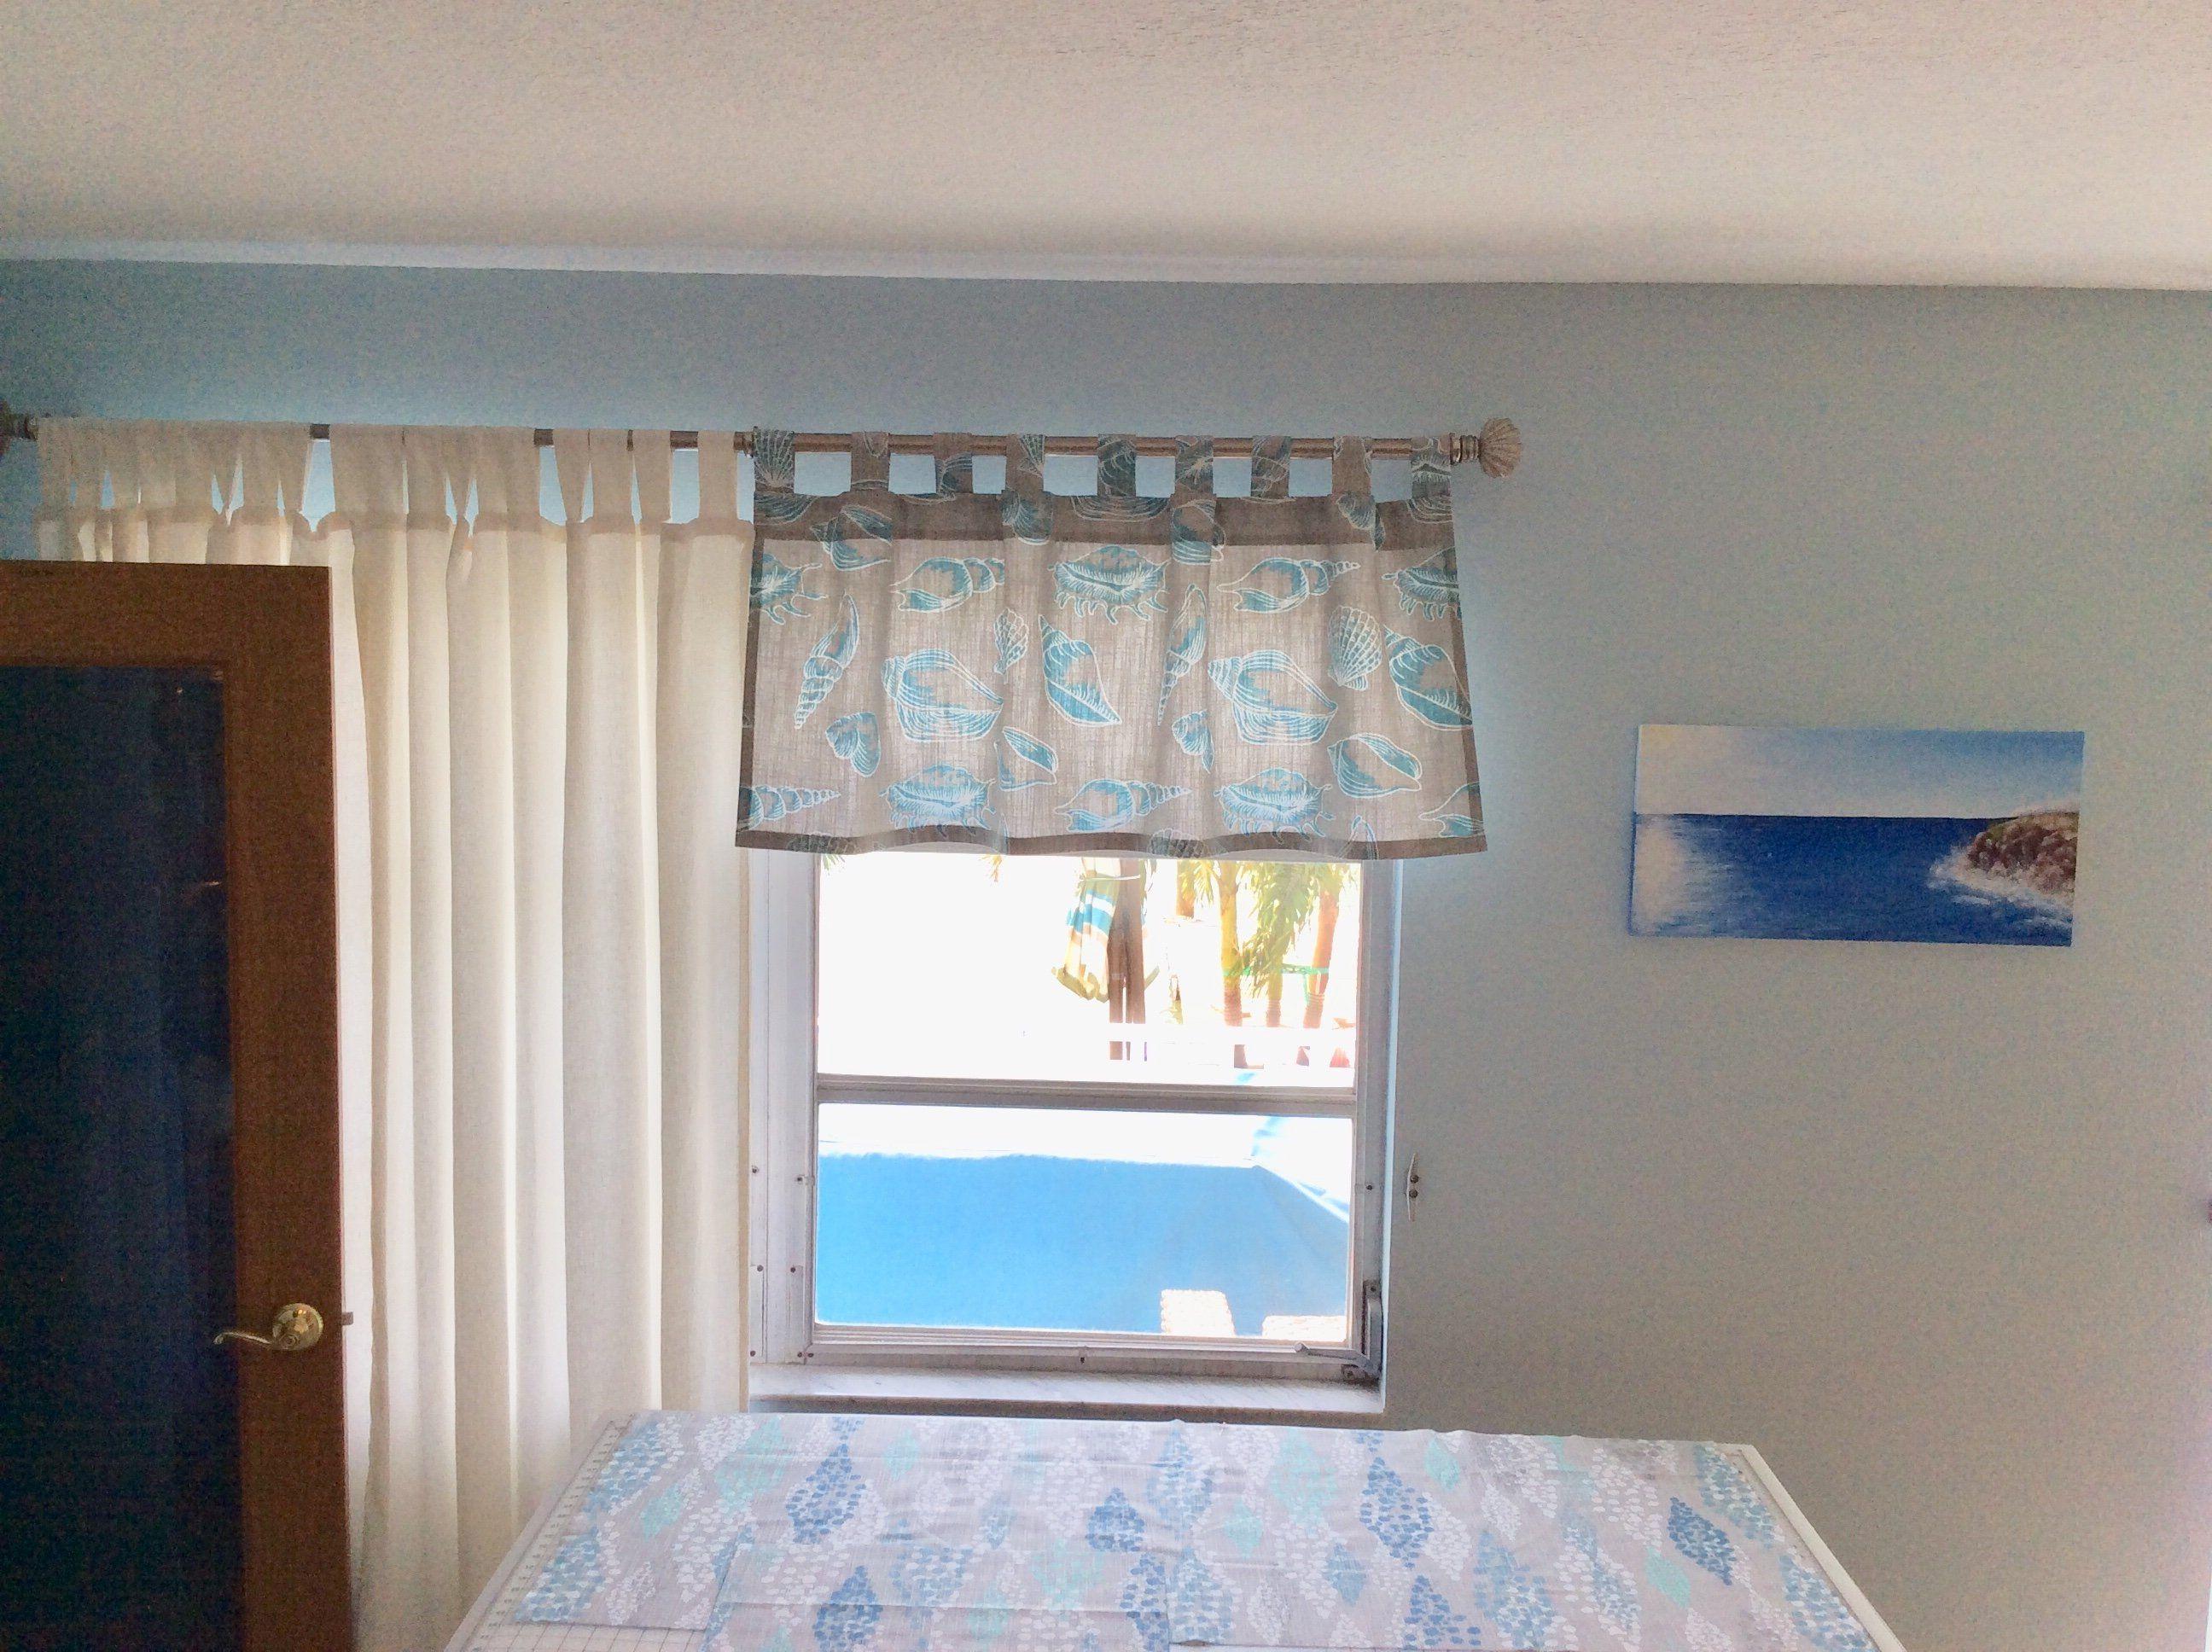 Tab Top Seashell Valance Valance Cafe Curtains Home Decor Fabric